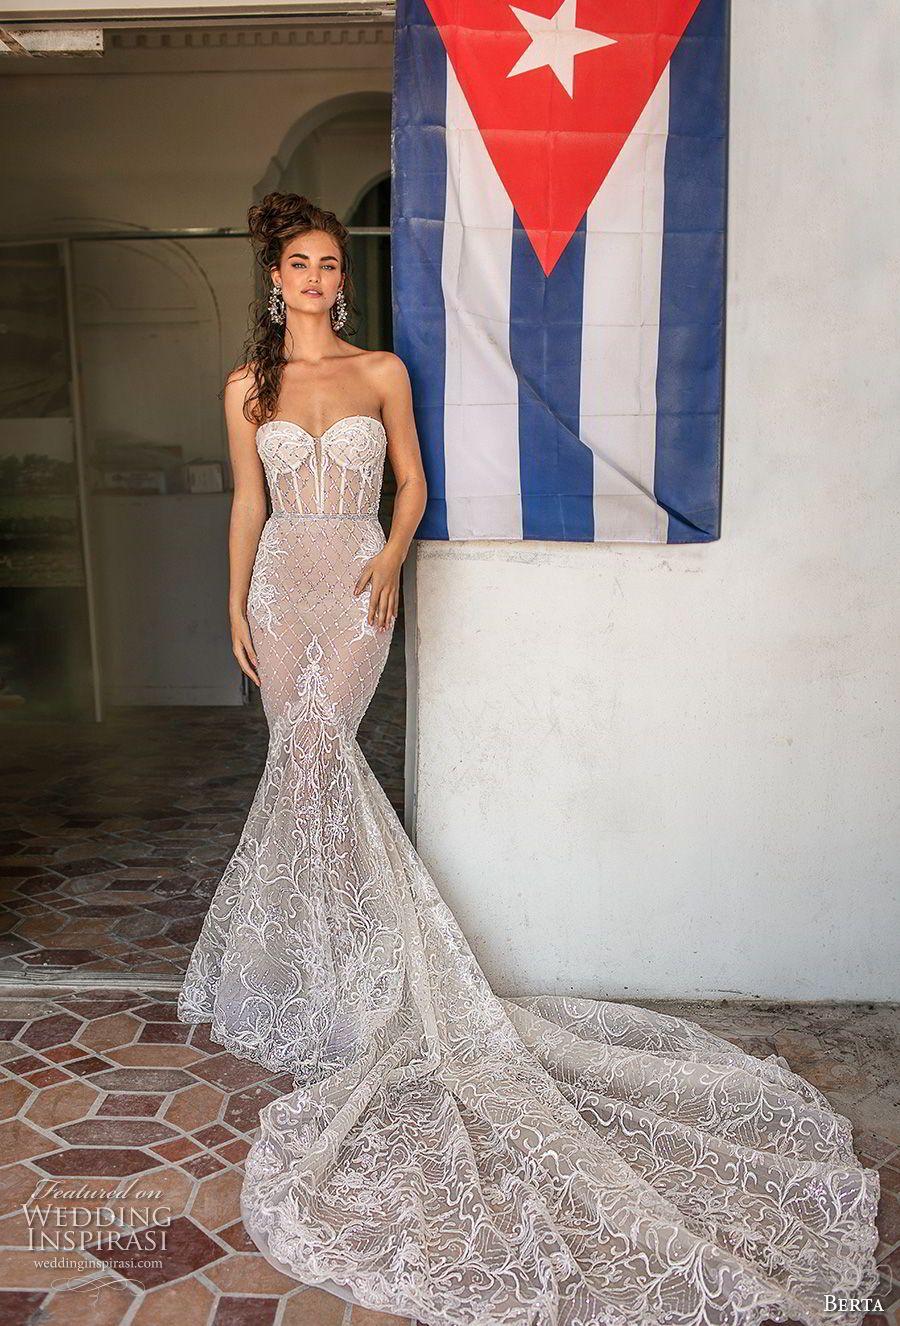 Berta Spring 2019 Wedding Dresses Miami Bridal Collection Wedding Inspirasi Miami Wedding Dress Wedding Dresses Mermaid Sweetheart Wedding Dresses [ 1326 x 900 Pixel ]